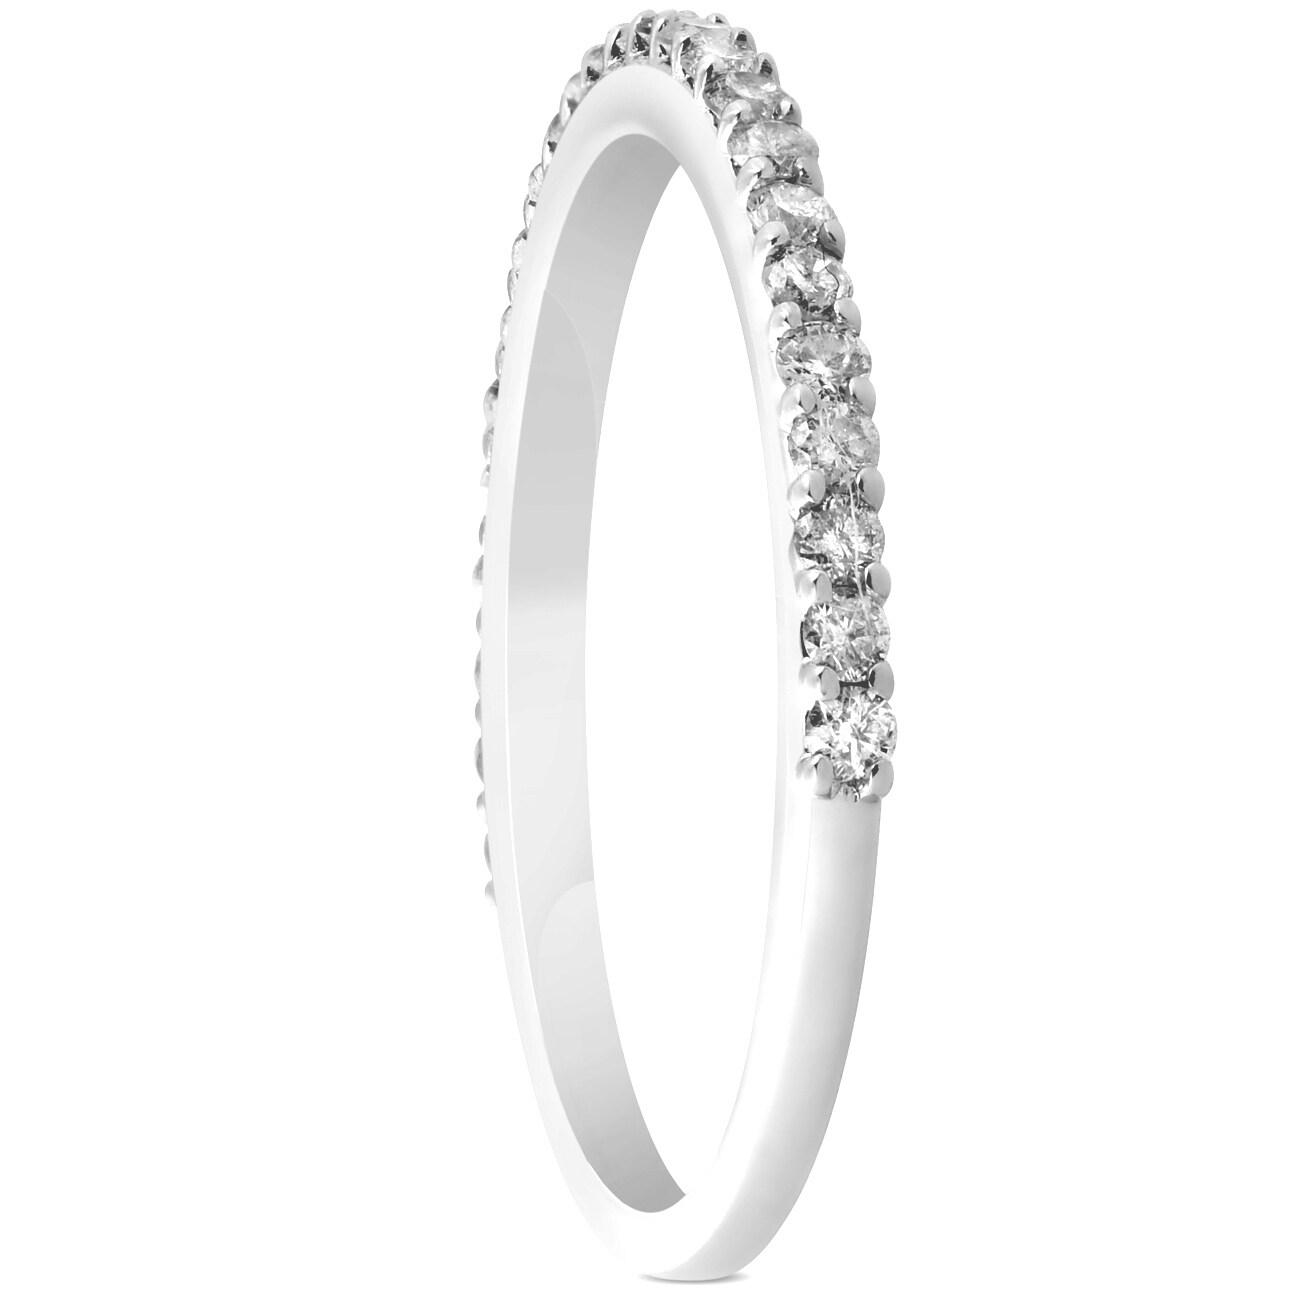 fc3350a94 Shop Bliss 14k White Gold 1 4 Ct Tdw Diamond Wedding Ring Womens